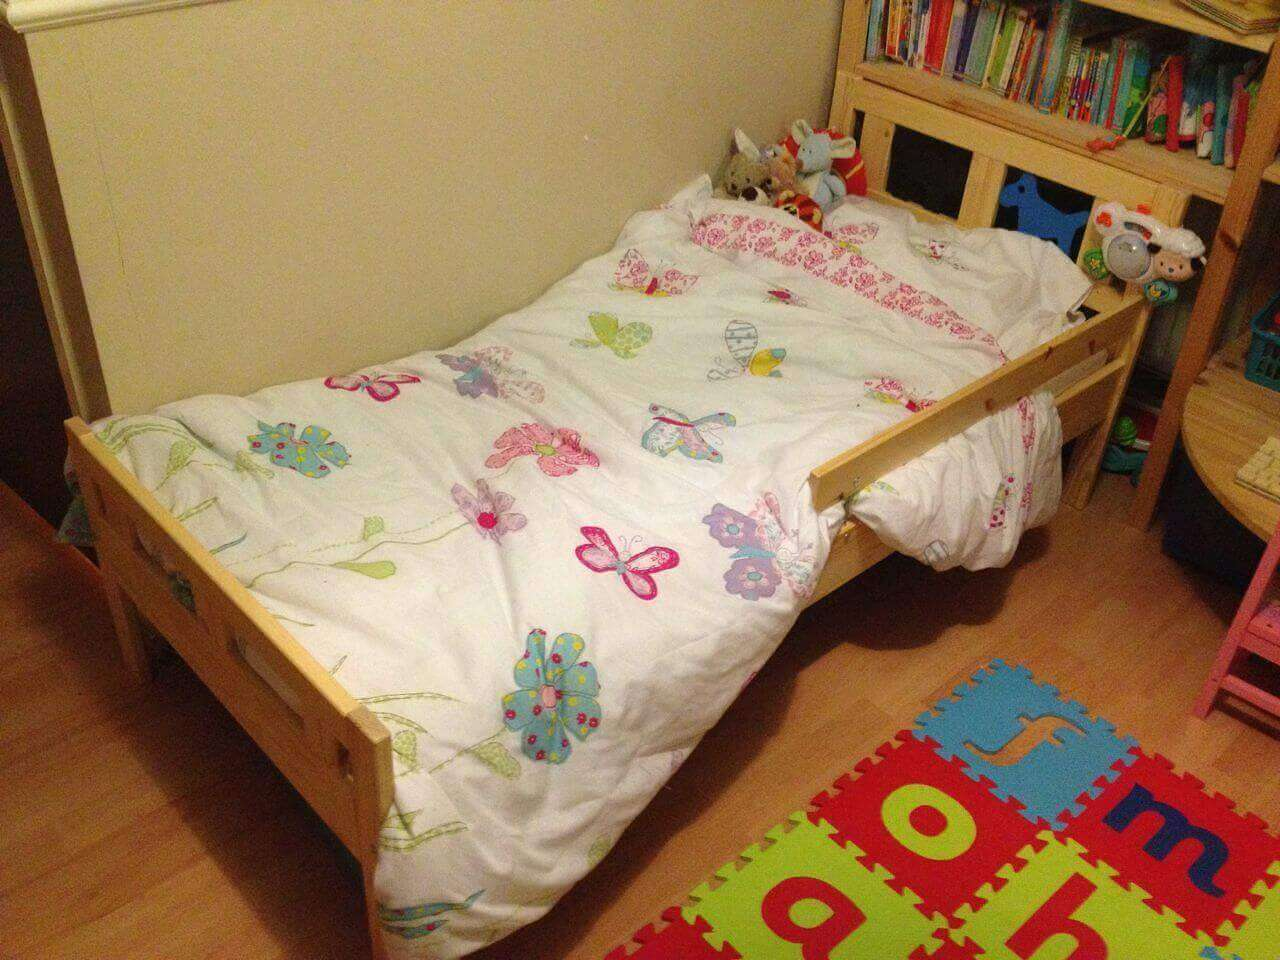 Ikea toddler bed kritter - Ikea Kritter Toddler Bed Ebay